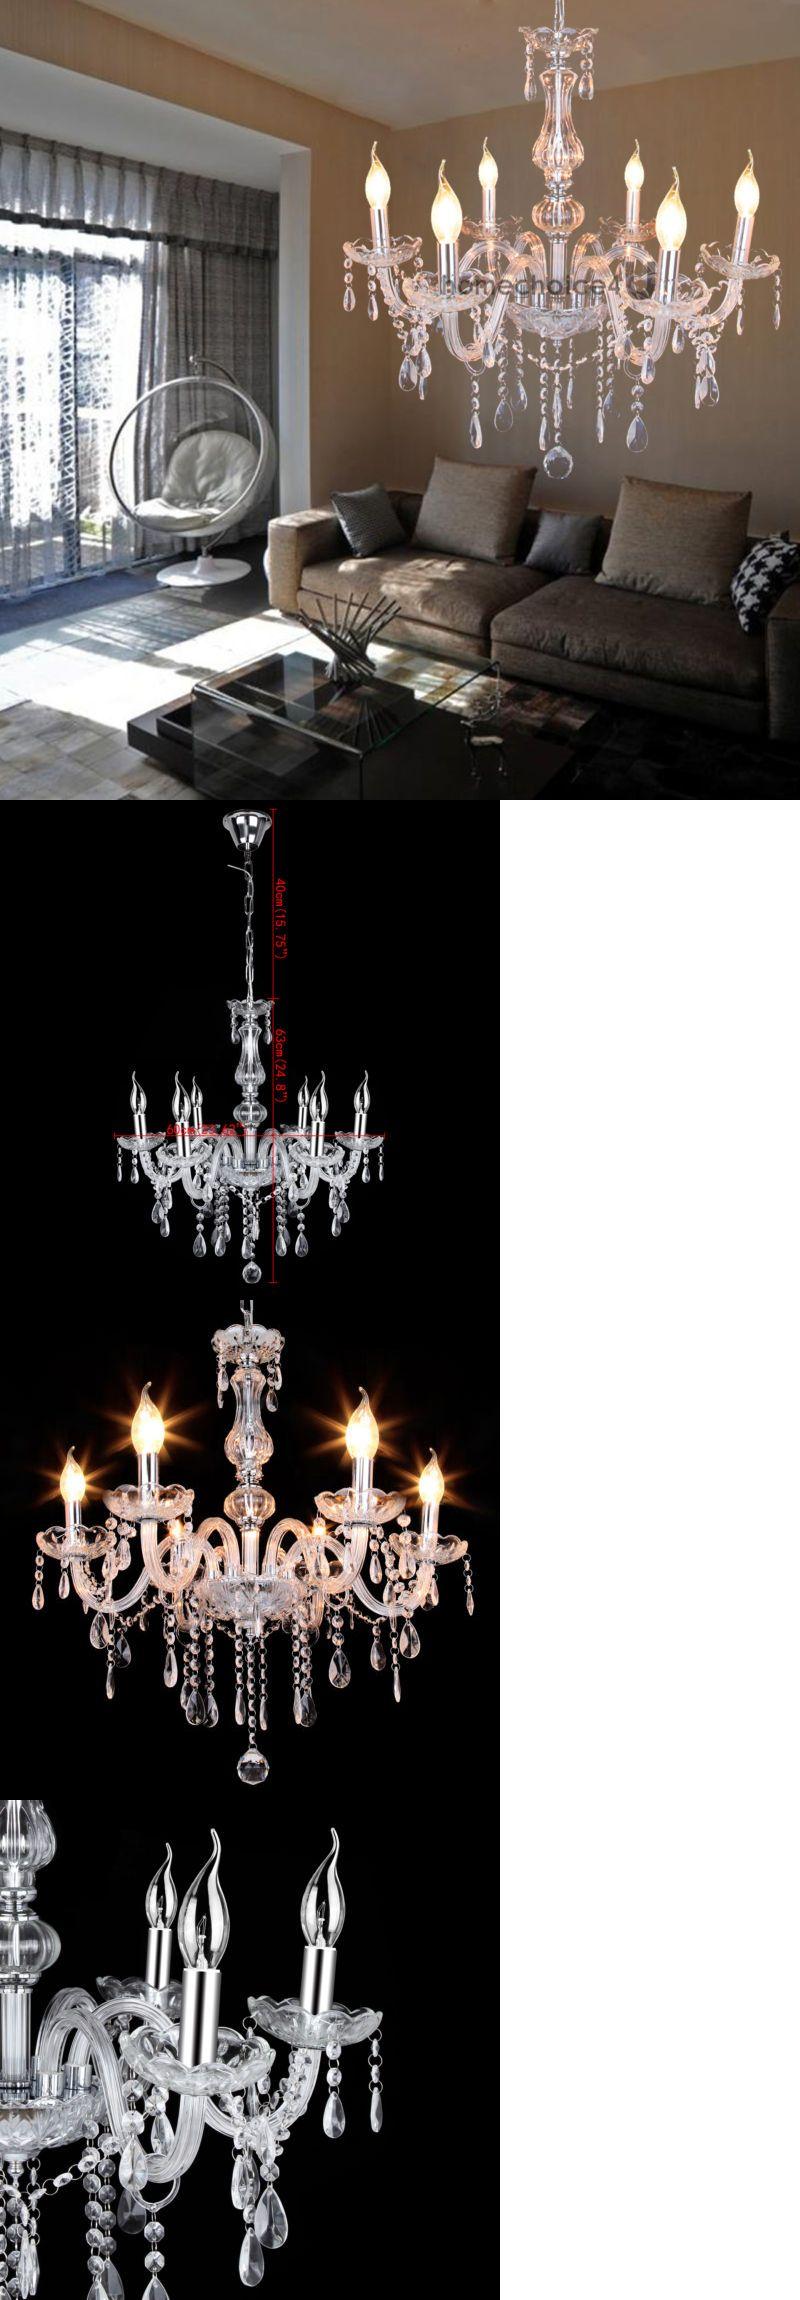 Chandeliers and ceiling fixtures elegant crystal chandelier